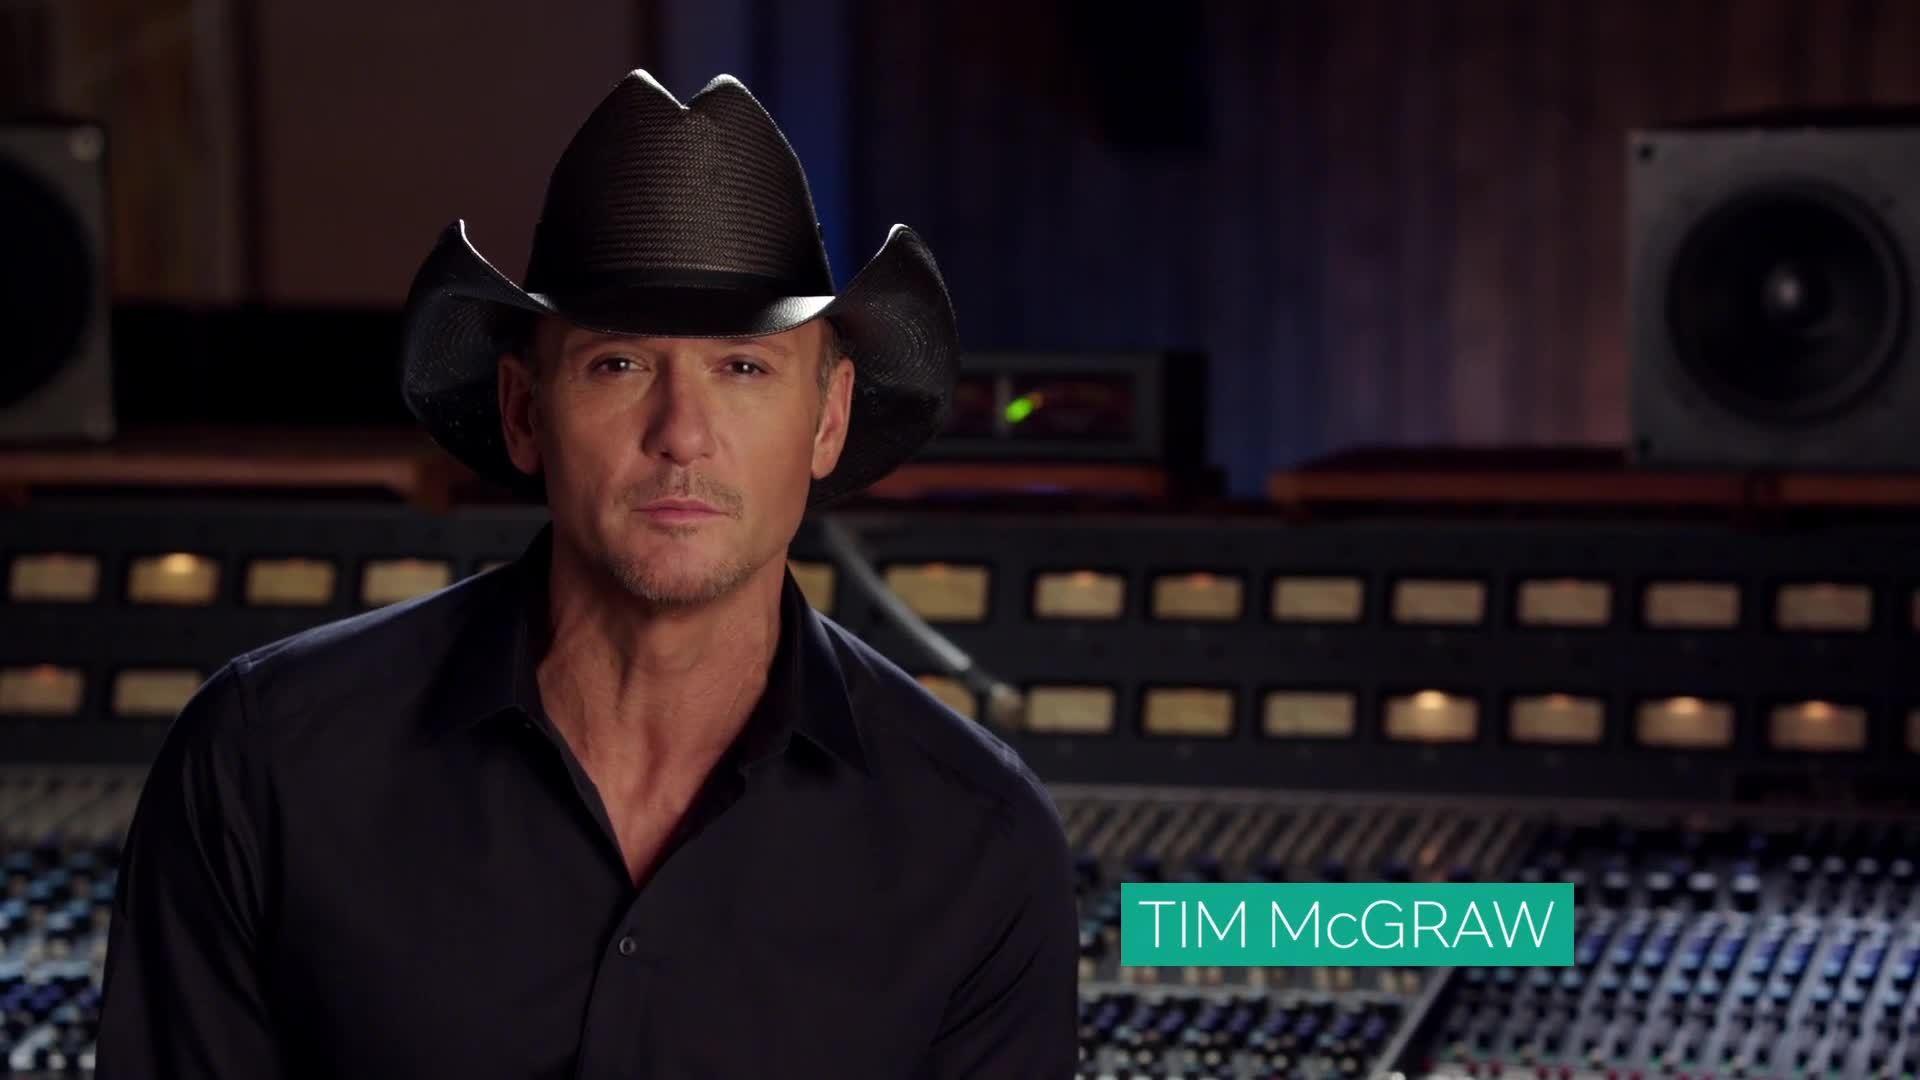 Tim McGraw speaks about type 2 diabetes.